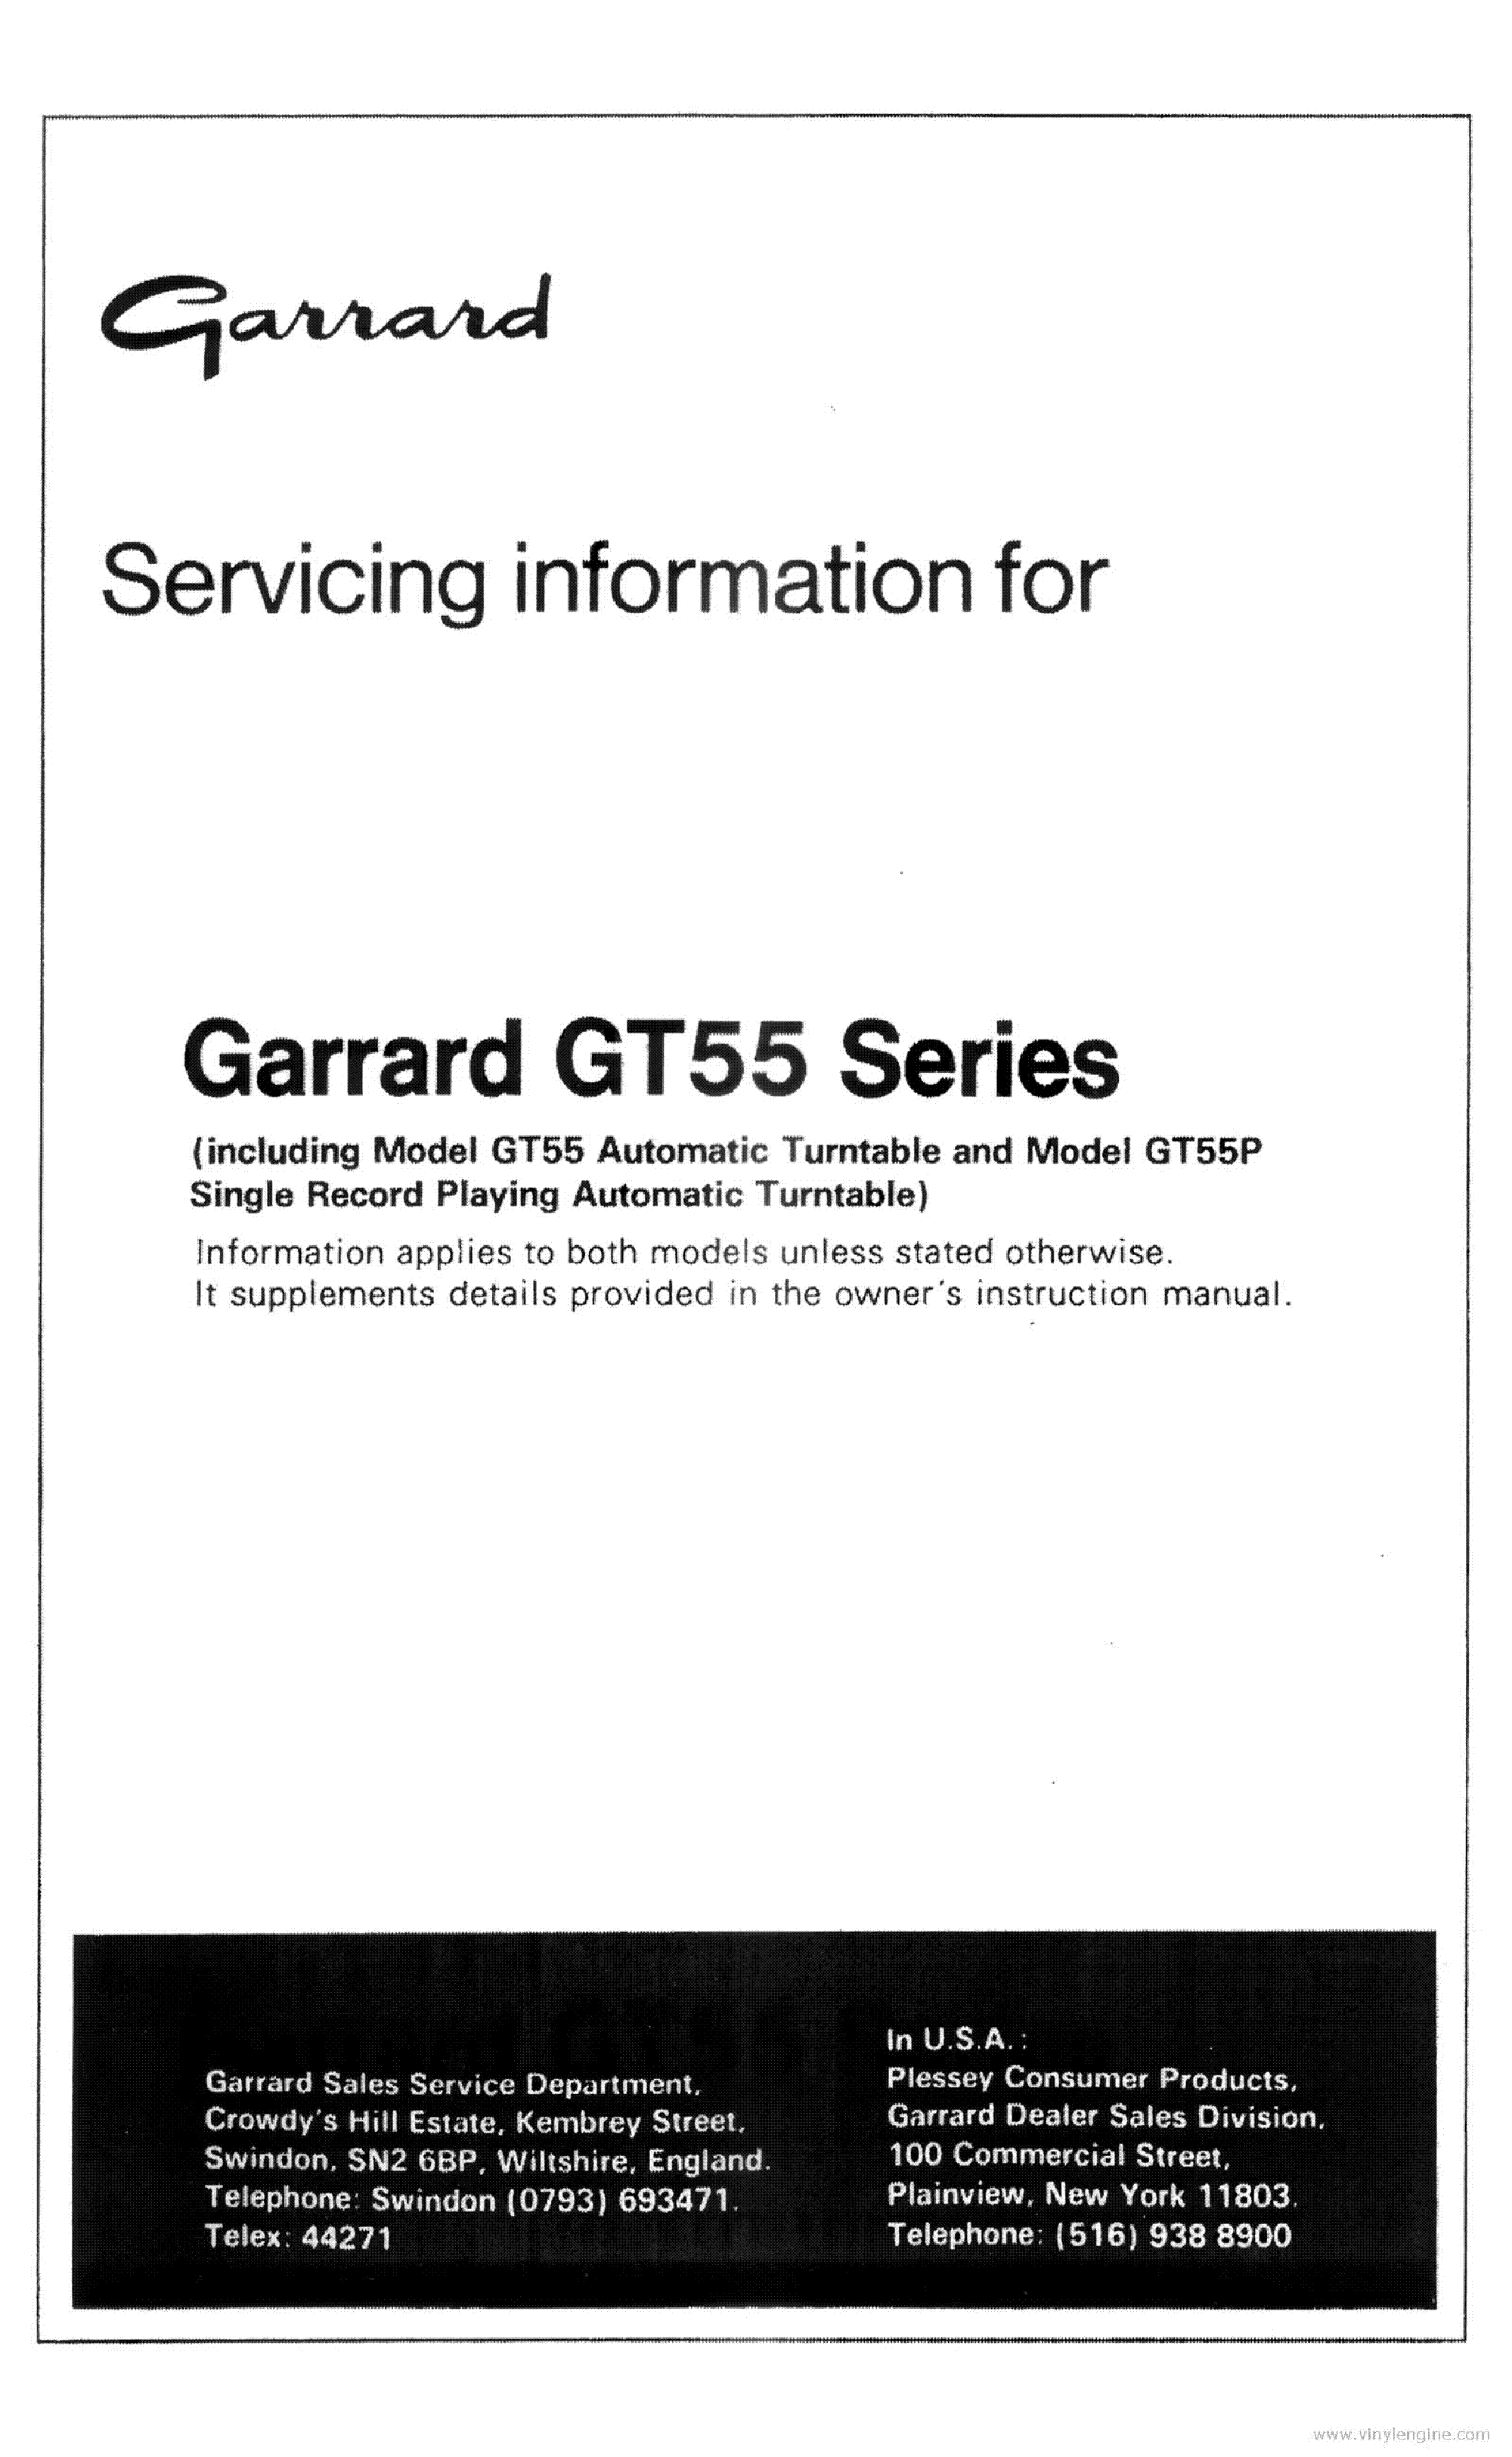 GARRARD GT55 GT55P TURNTABLE Service Manual download